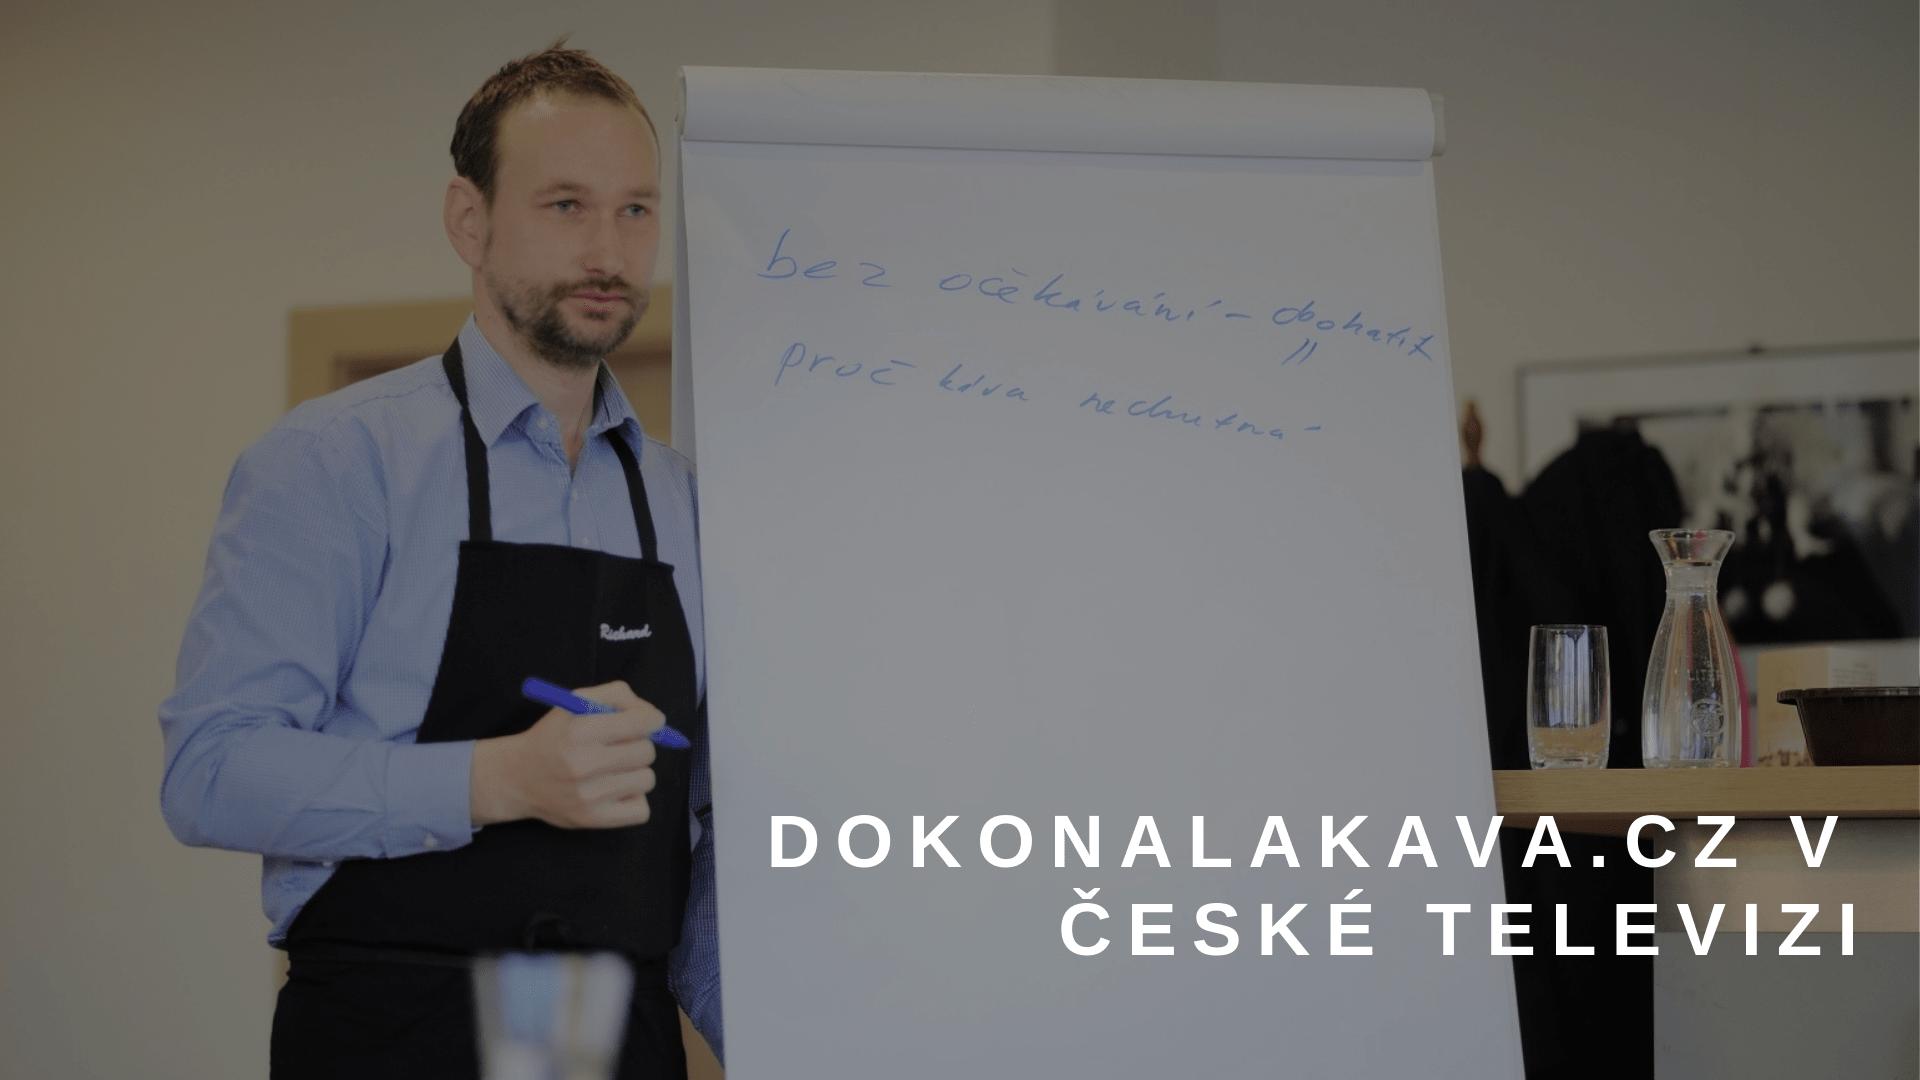 Dokonalakava.cz v TV